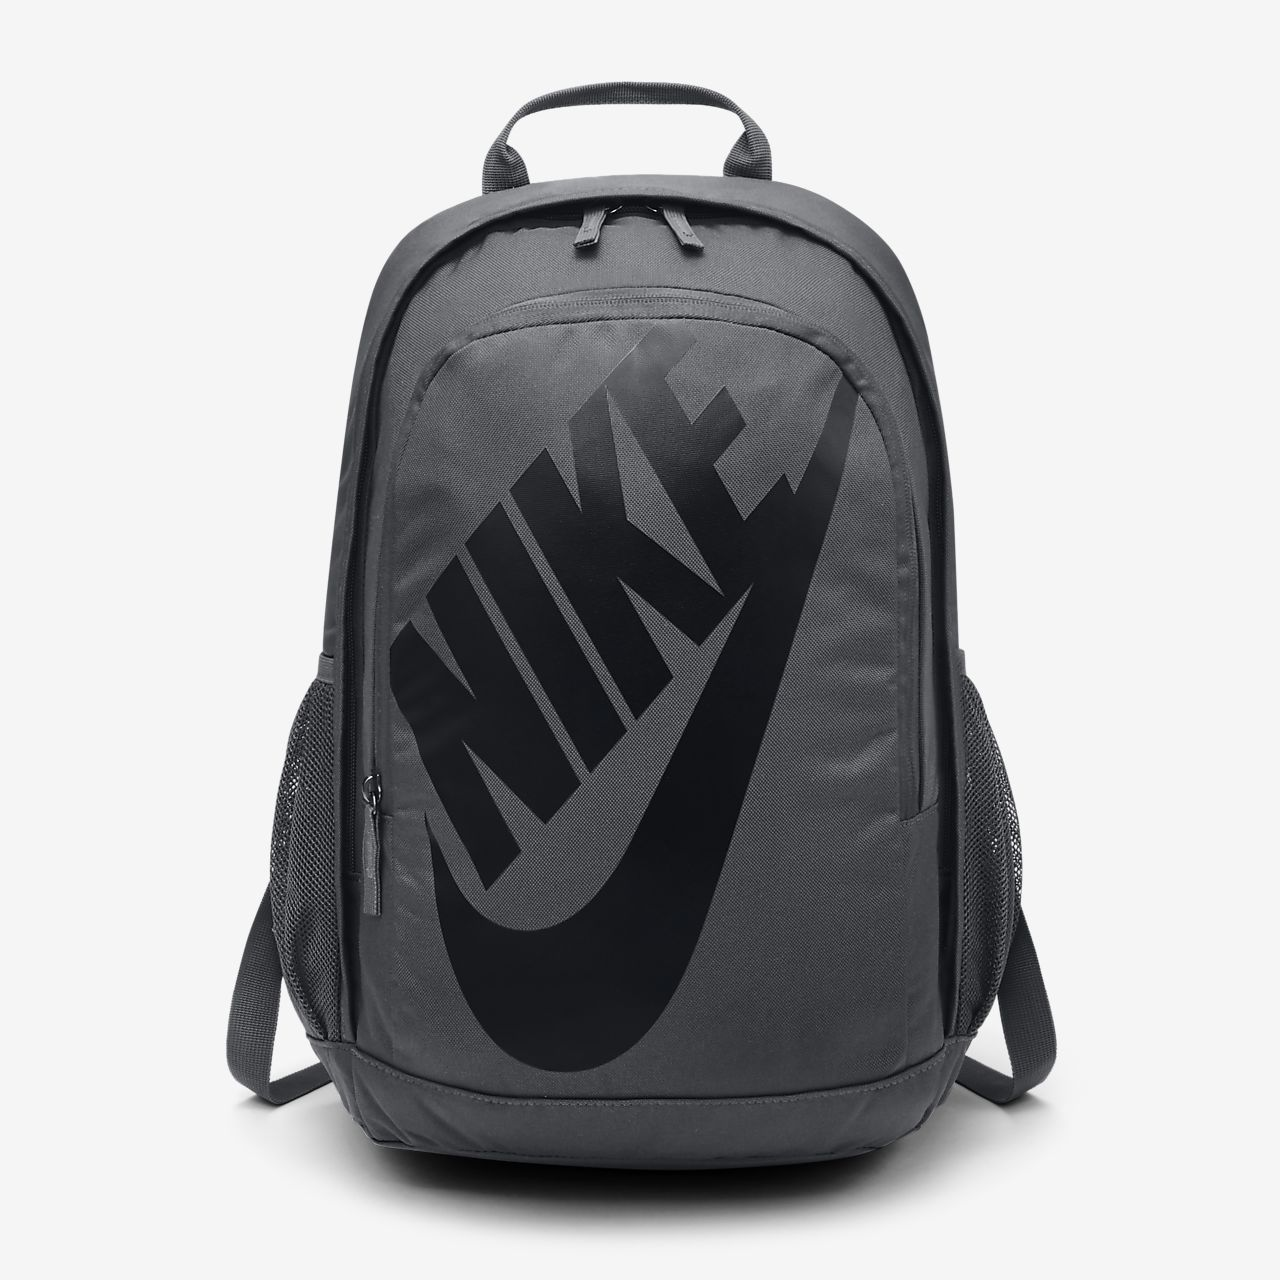 4c4cf3775b17f Plecak Nike Sportswear Hayward Futura 2.0. Nike.com PL